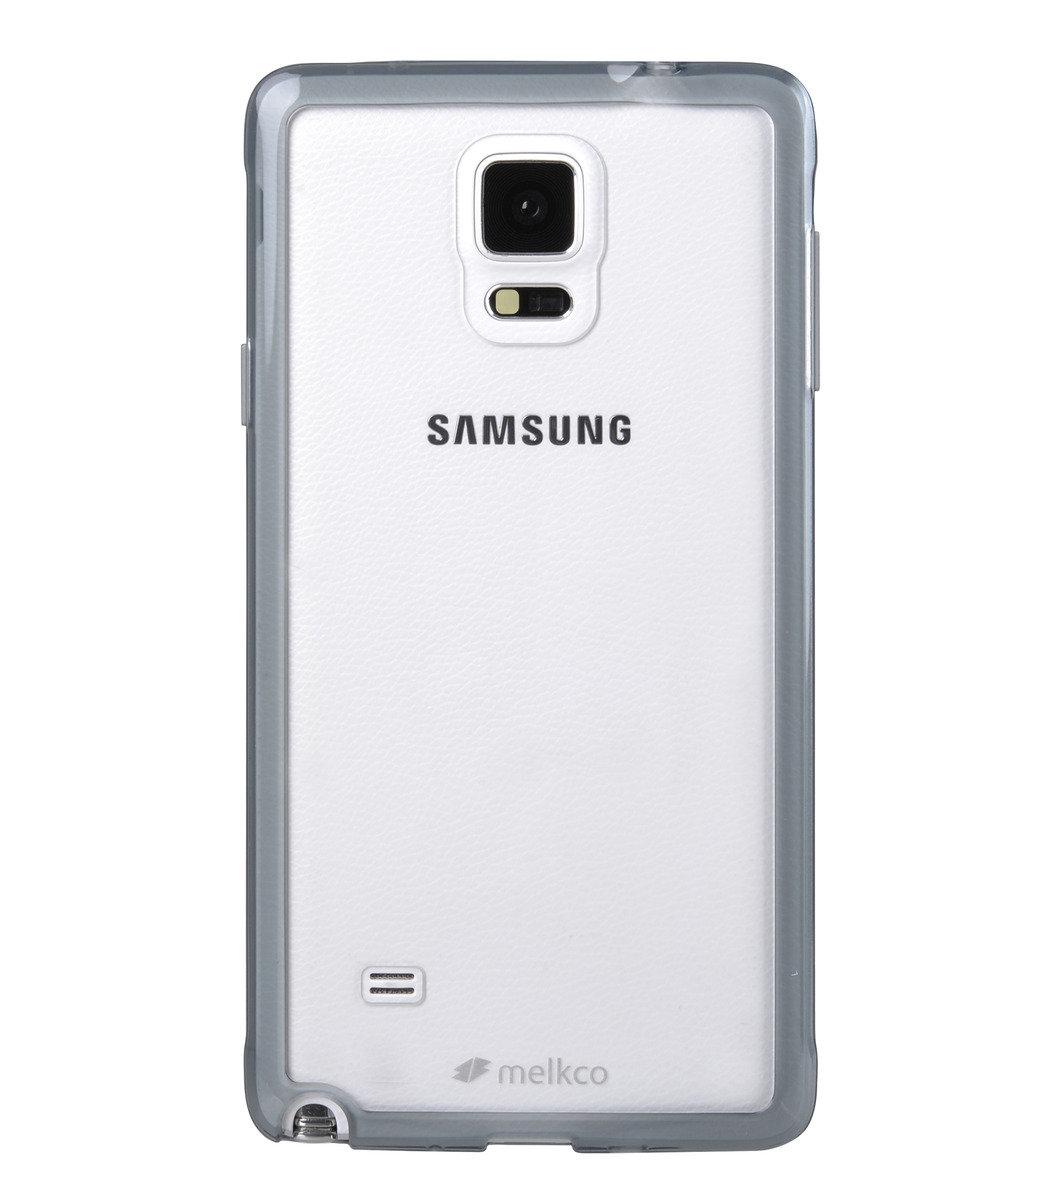 Galaxy Note 4 PolyUltima手機保護殼 - 透明黑色(附送屏幕保護貼)